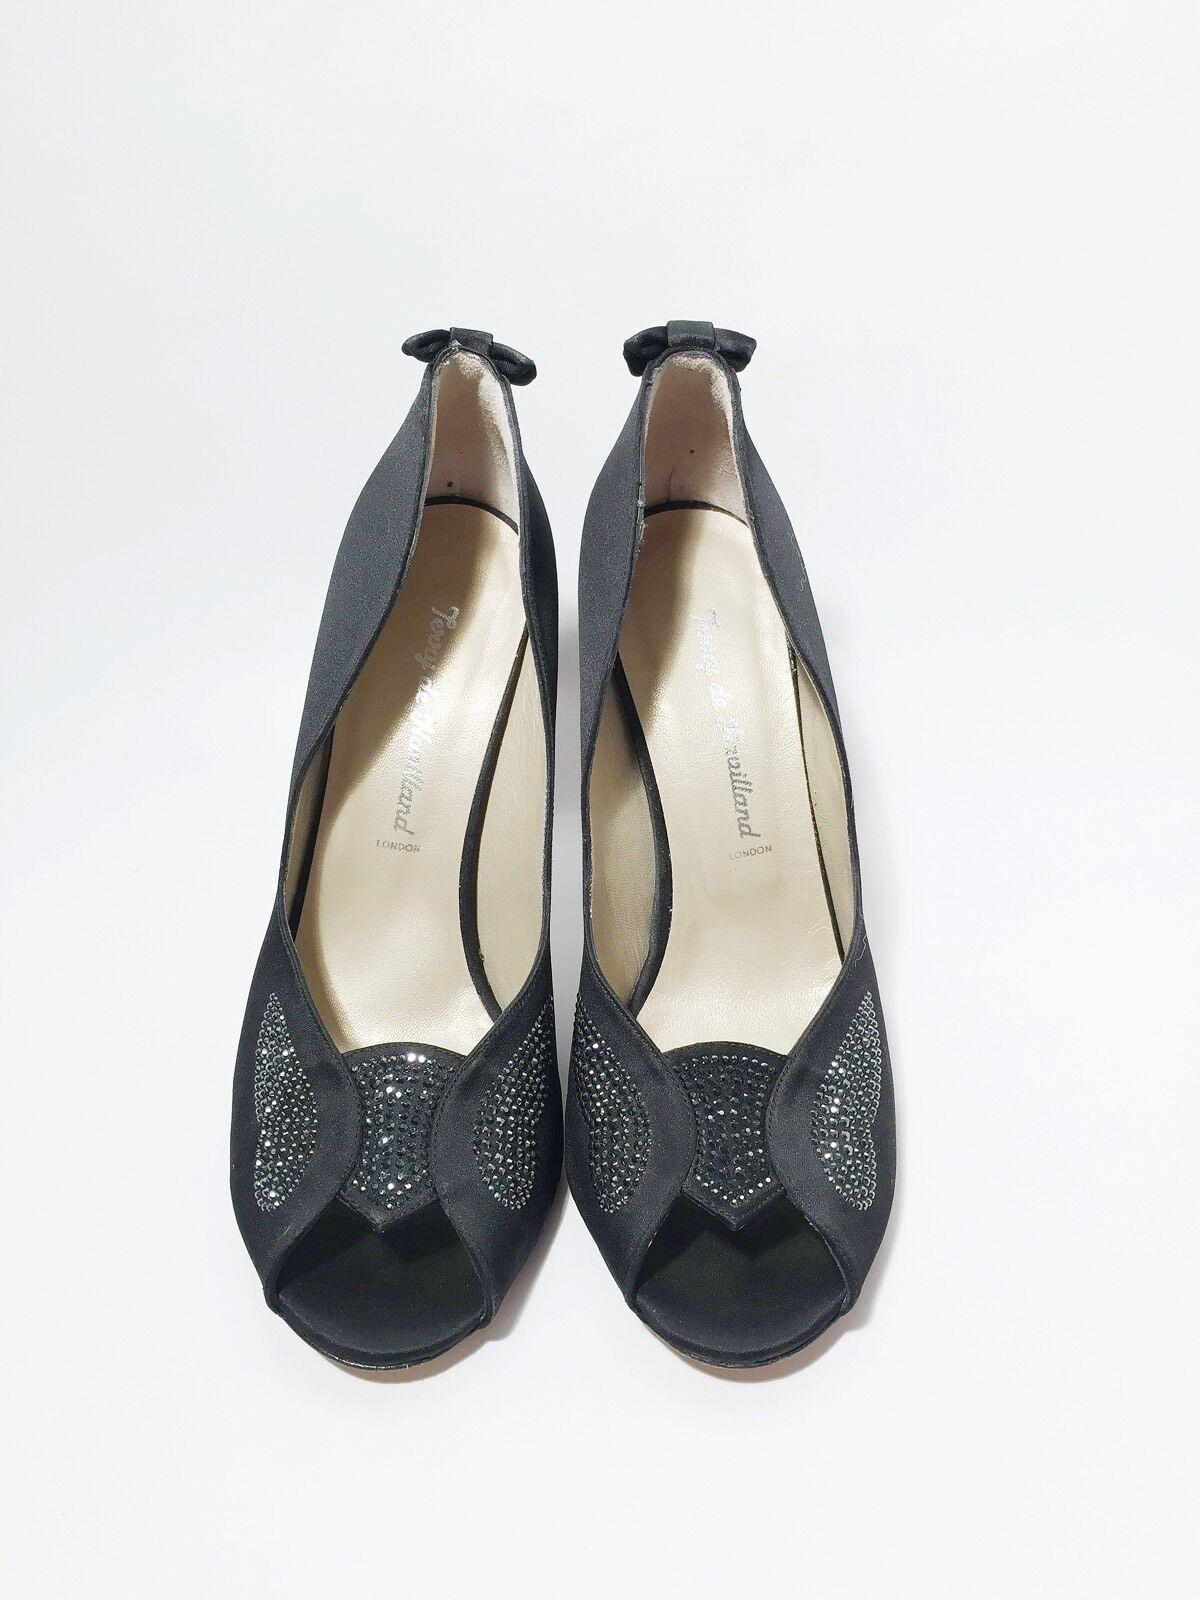 ultimi stili Terry De De De Havilland Dimensione 10 40 nero Silk Open Toe Heels  negozio online